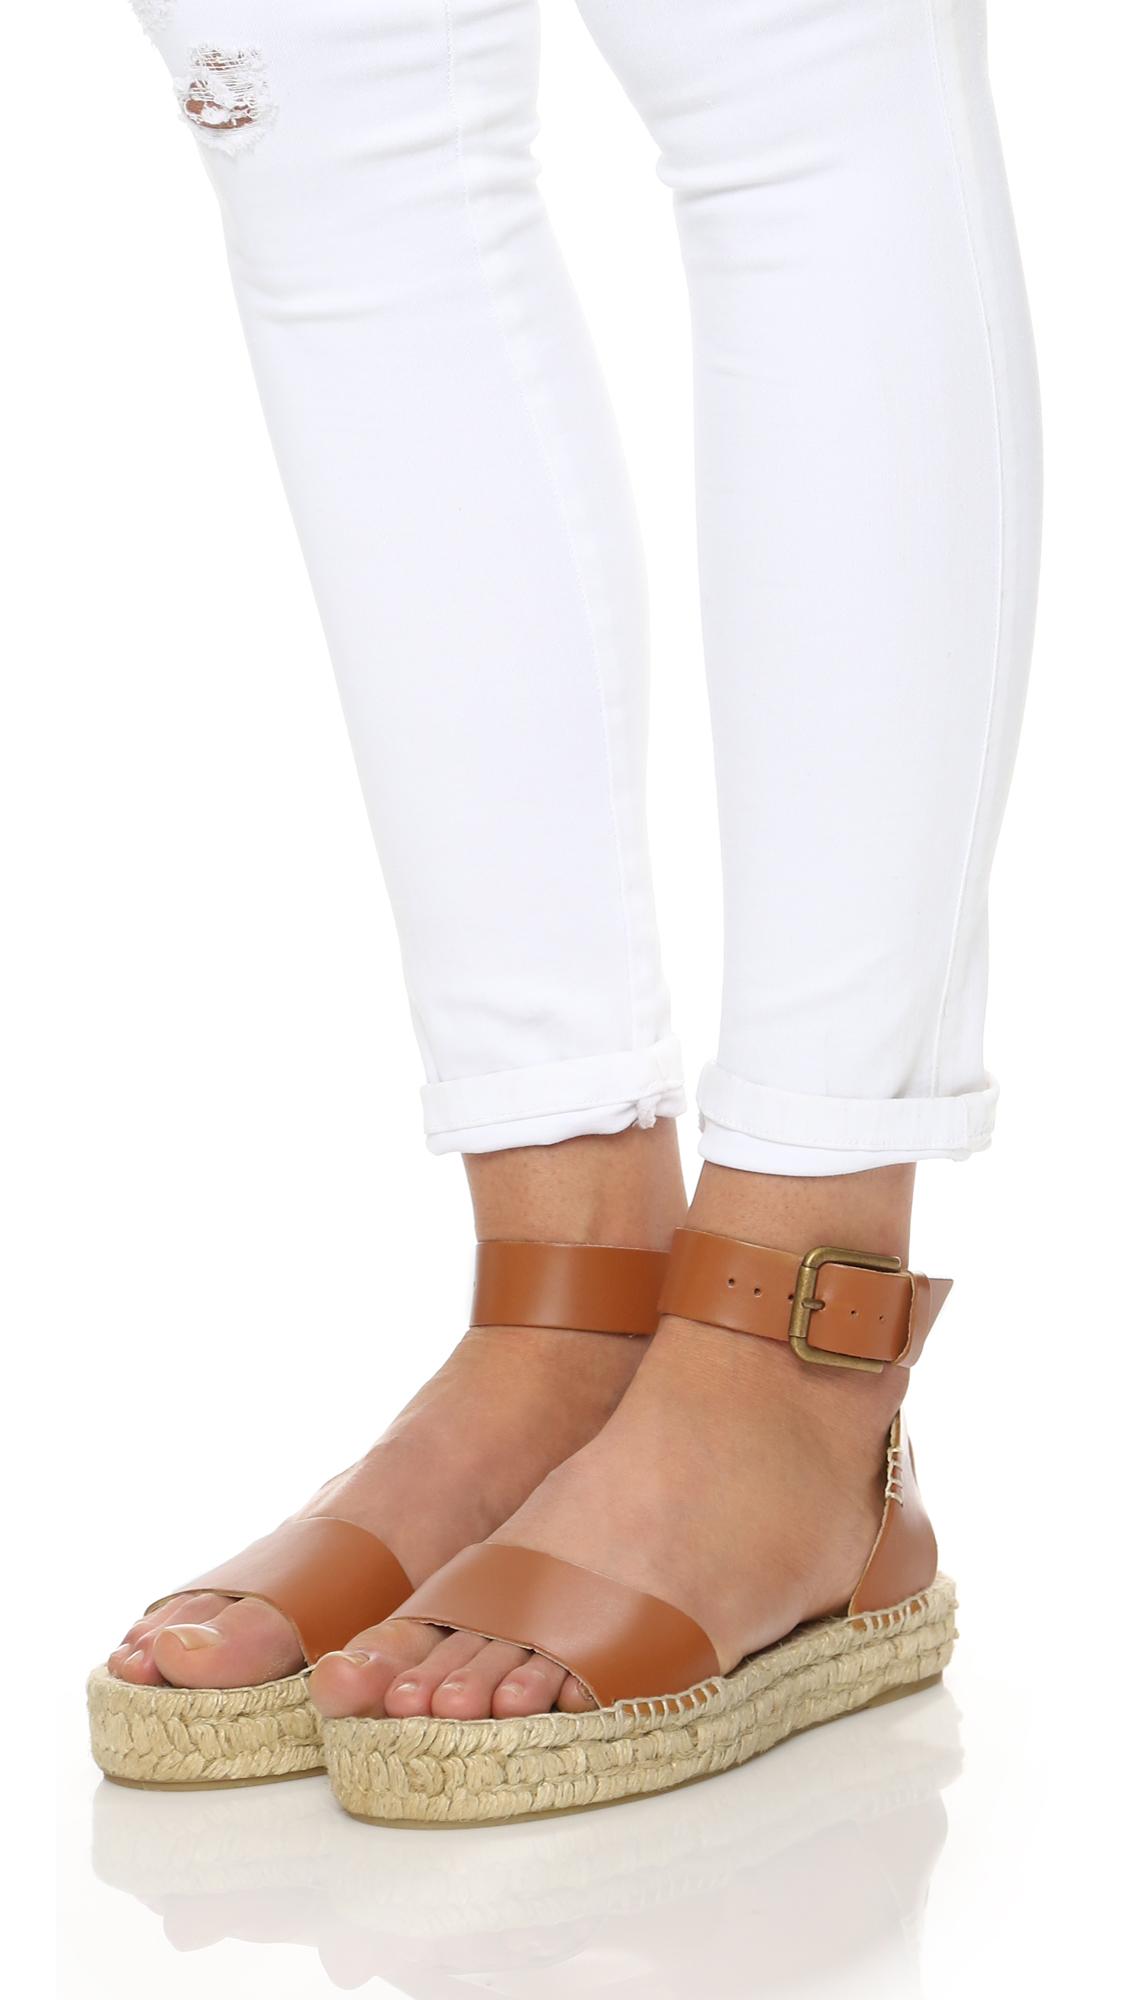 e283db14366 Soludos Platform Open Toe Sandals | SHOPBOP